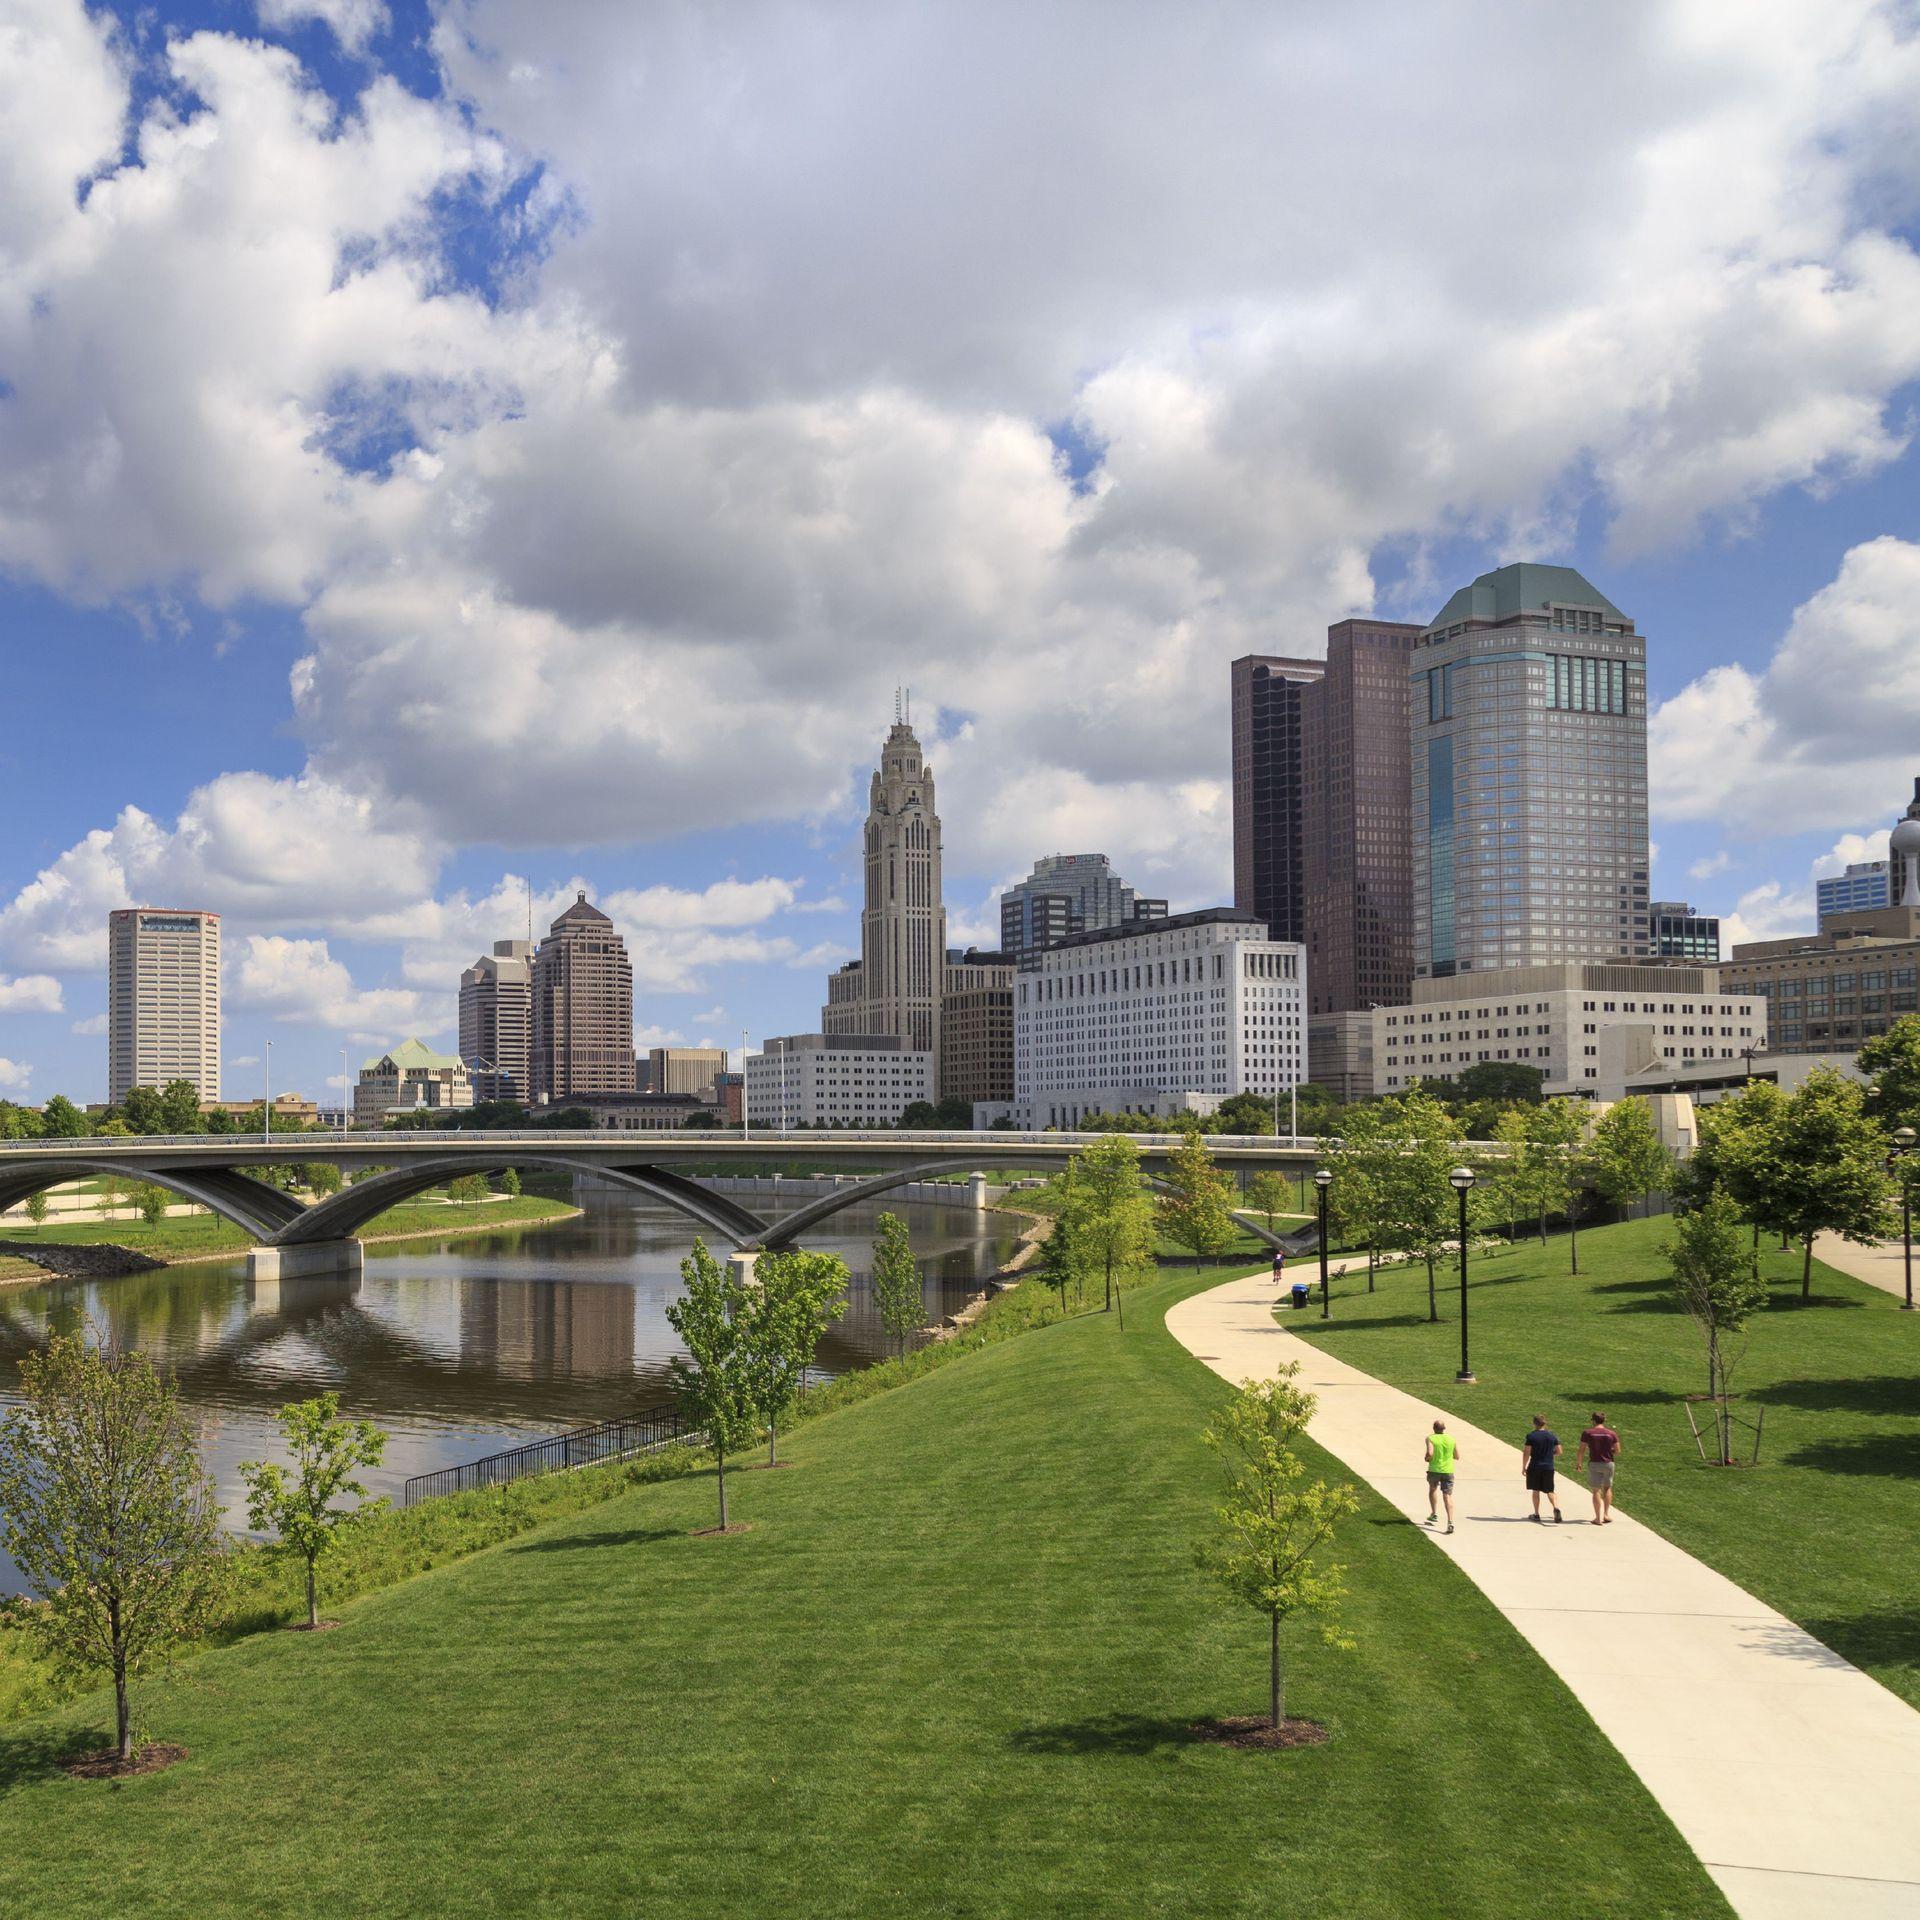 The Columbus, Ohio skyline, with a park, river, bridges and distant buildings.